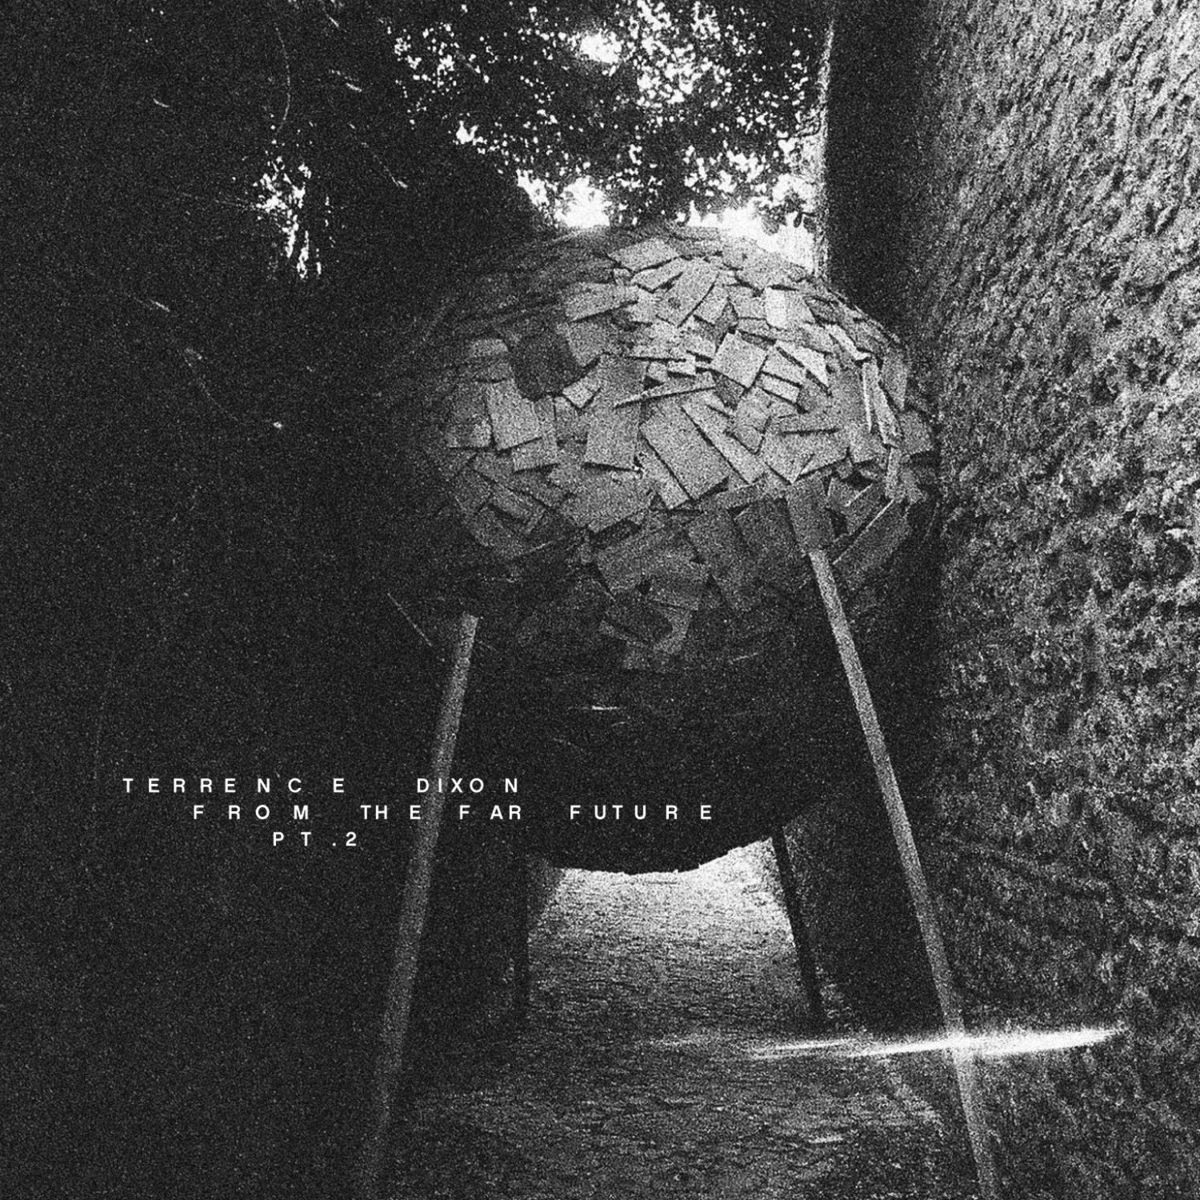 Terrence Dixon – From The Far Future Pt. 2 (Tresor)